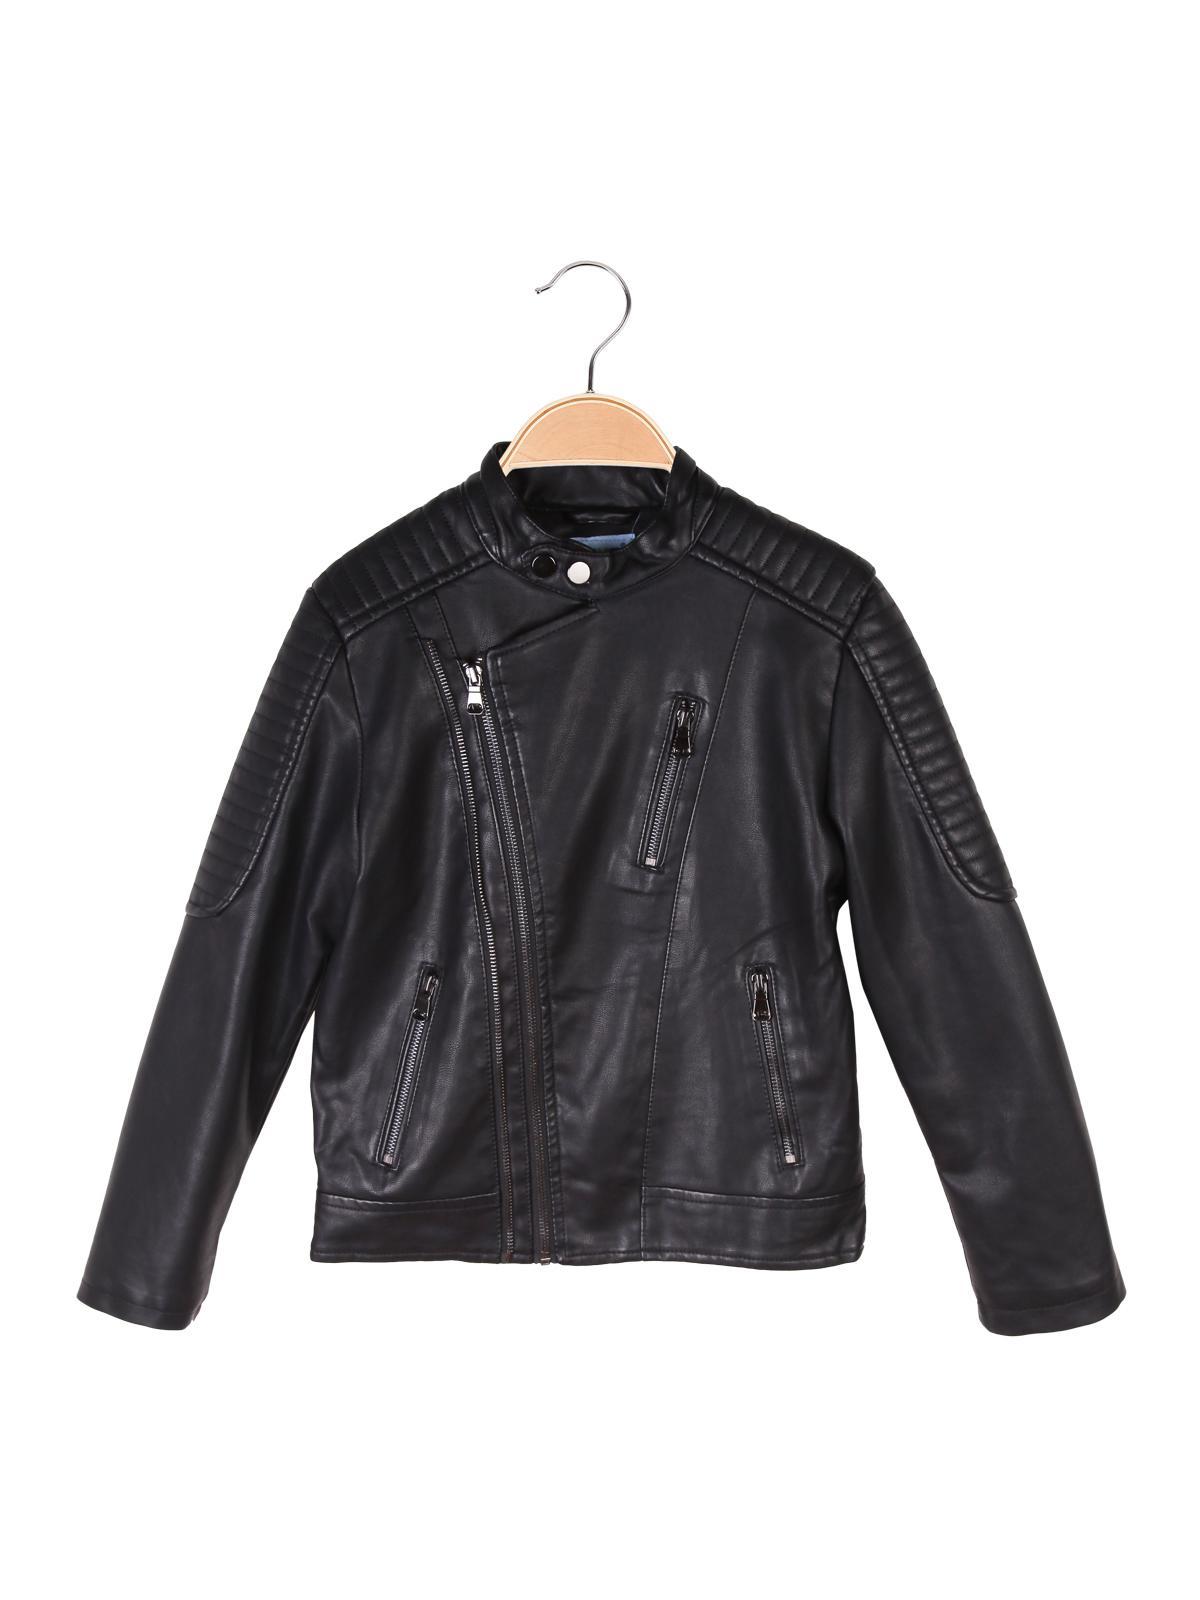 sale retailer 8bb97 44dc9 Giacca di pelle - black ativo | MecShopping